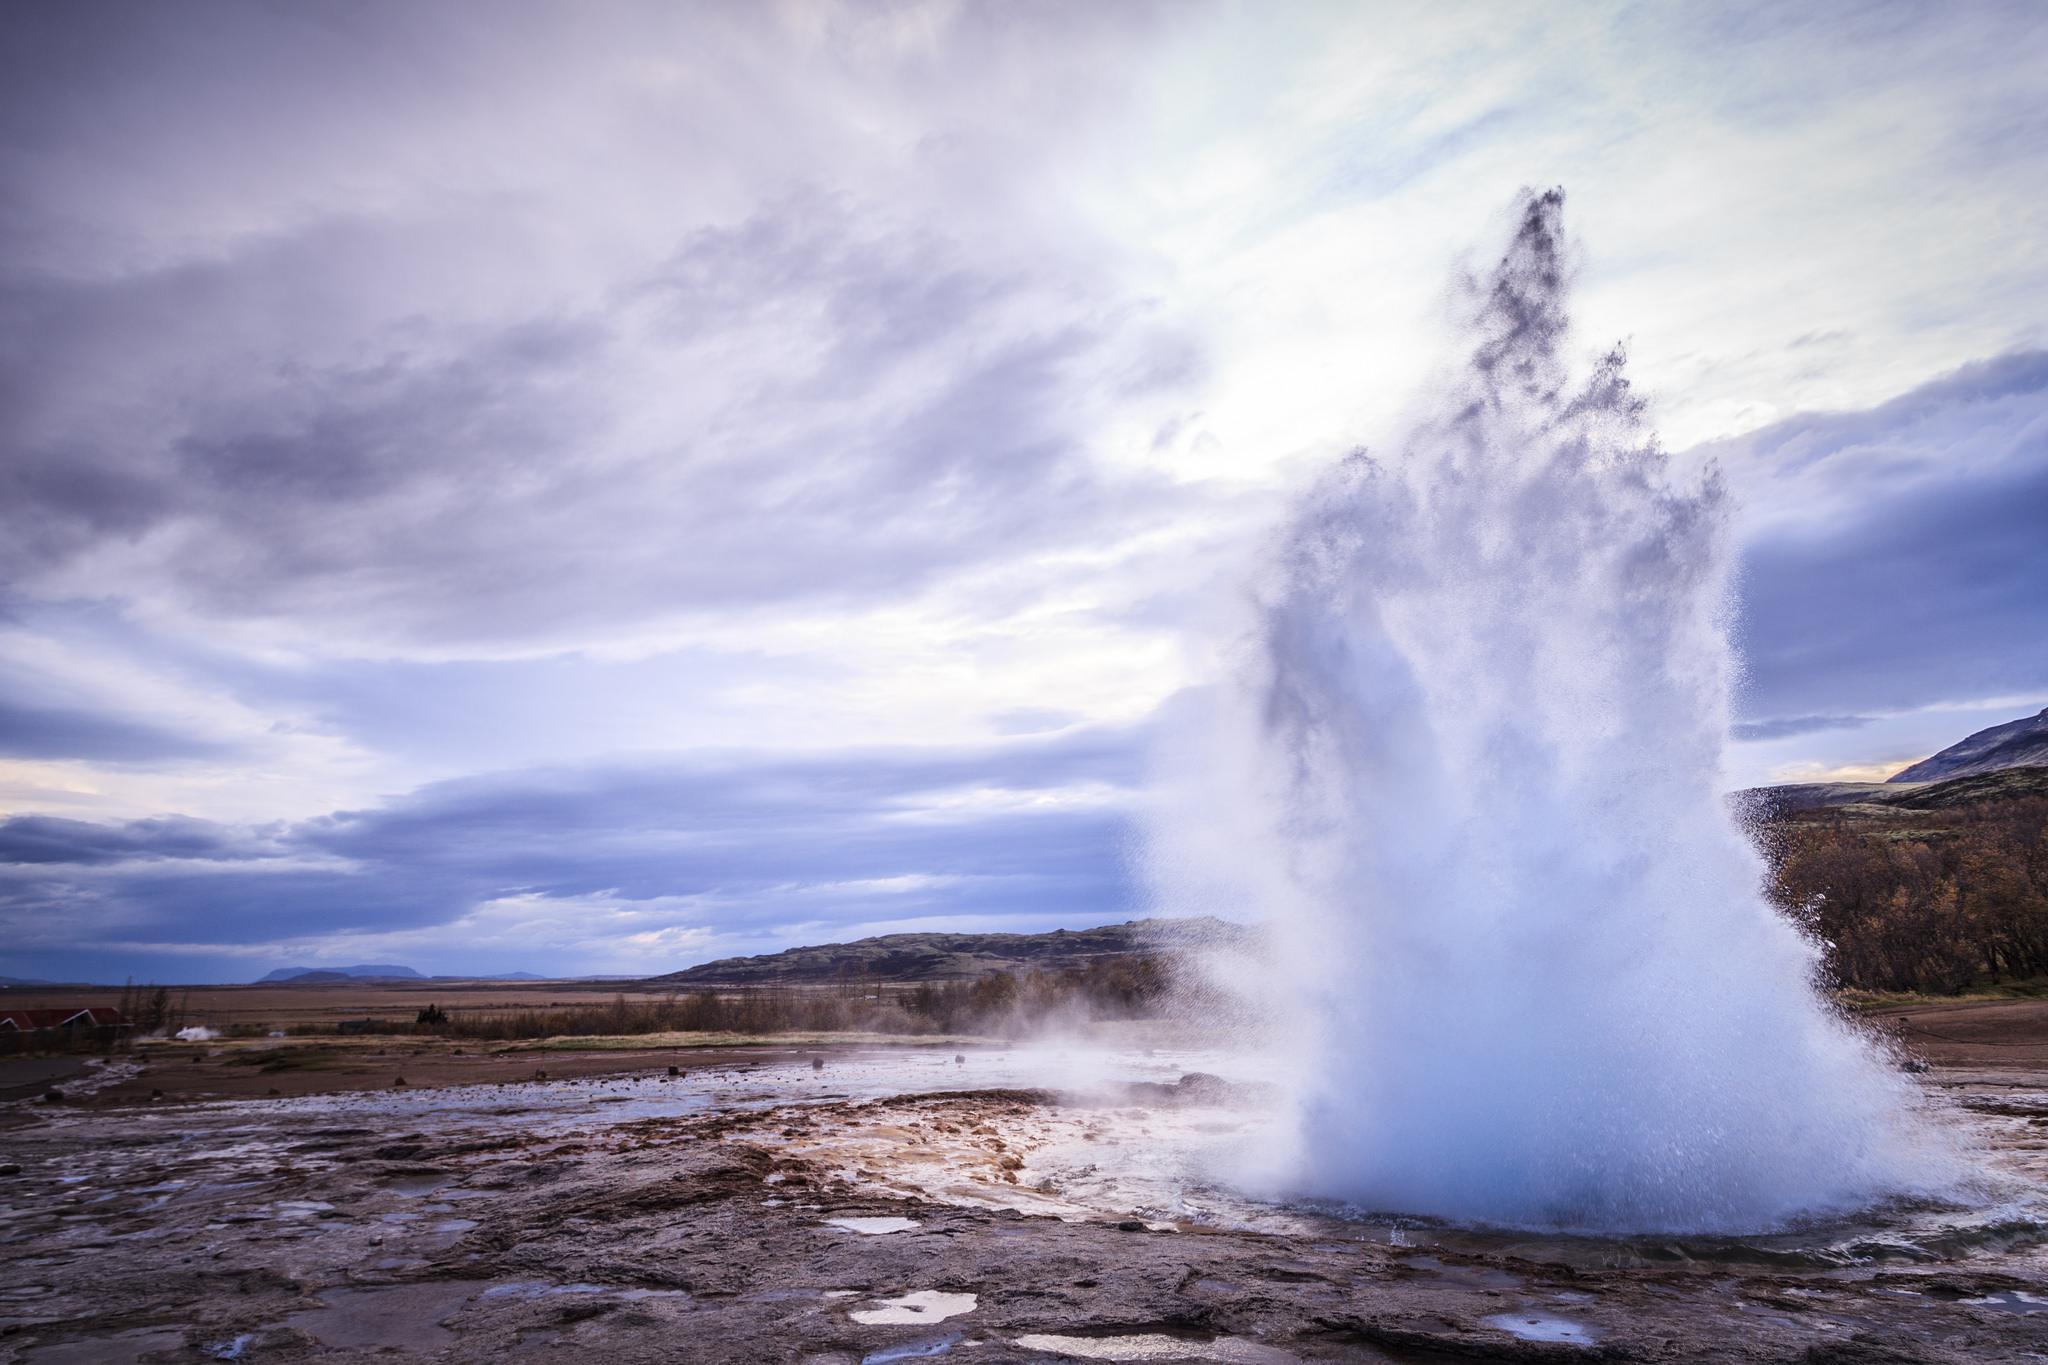 Geyser en Islande paysage